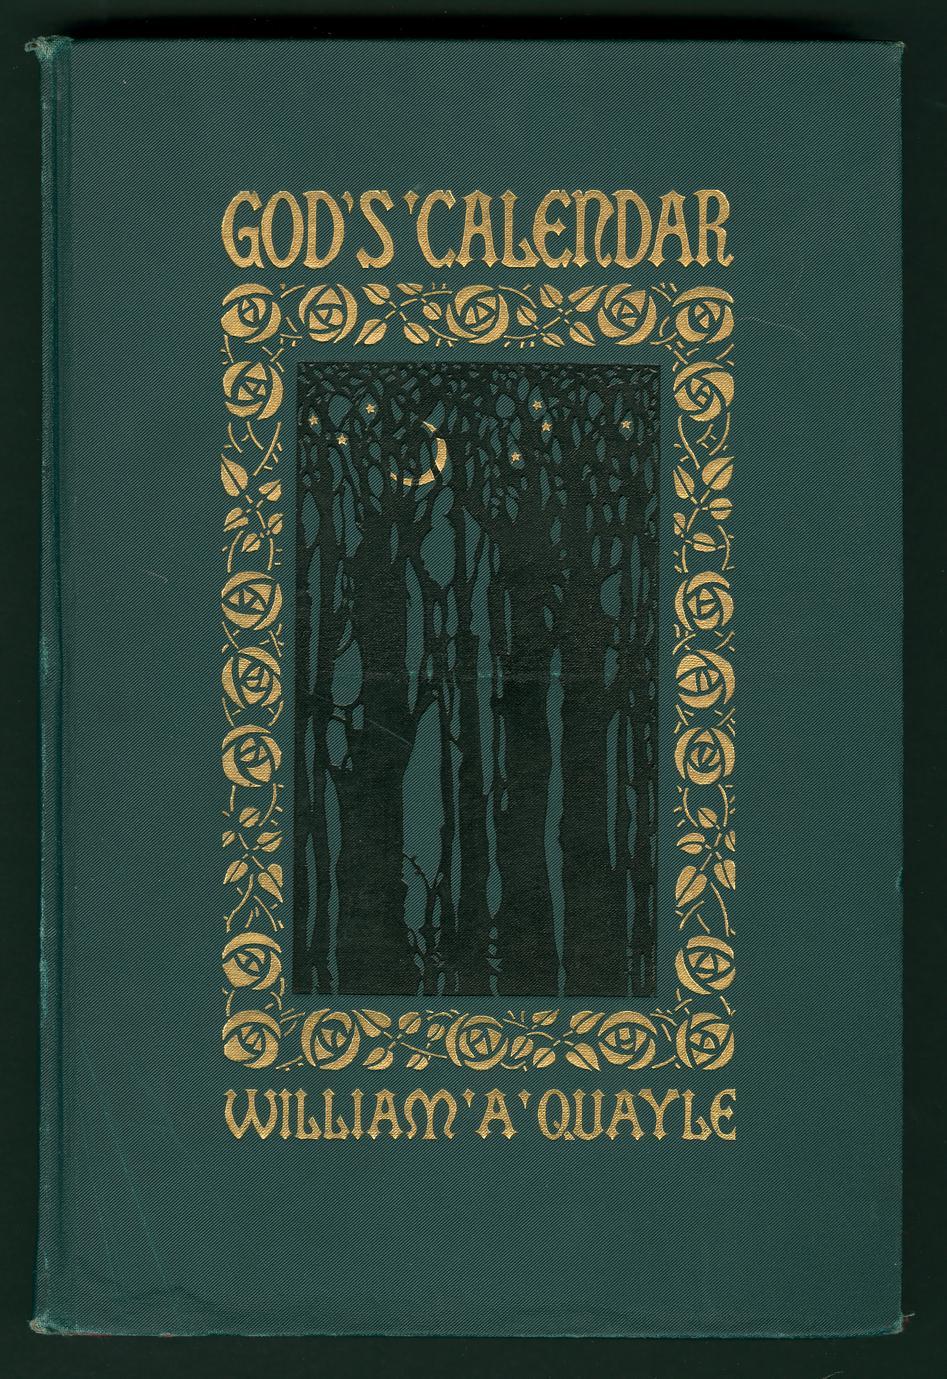 God's calendar (1 of 2)